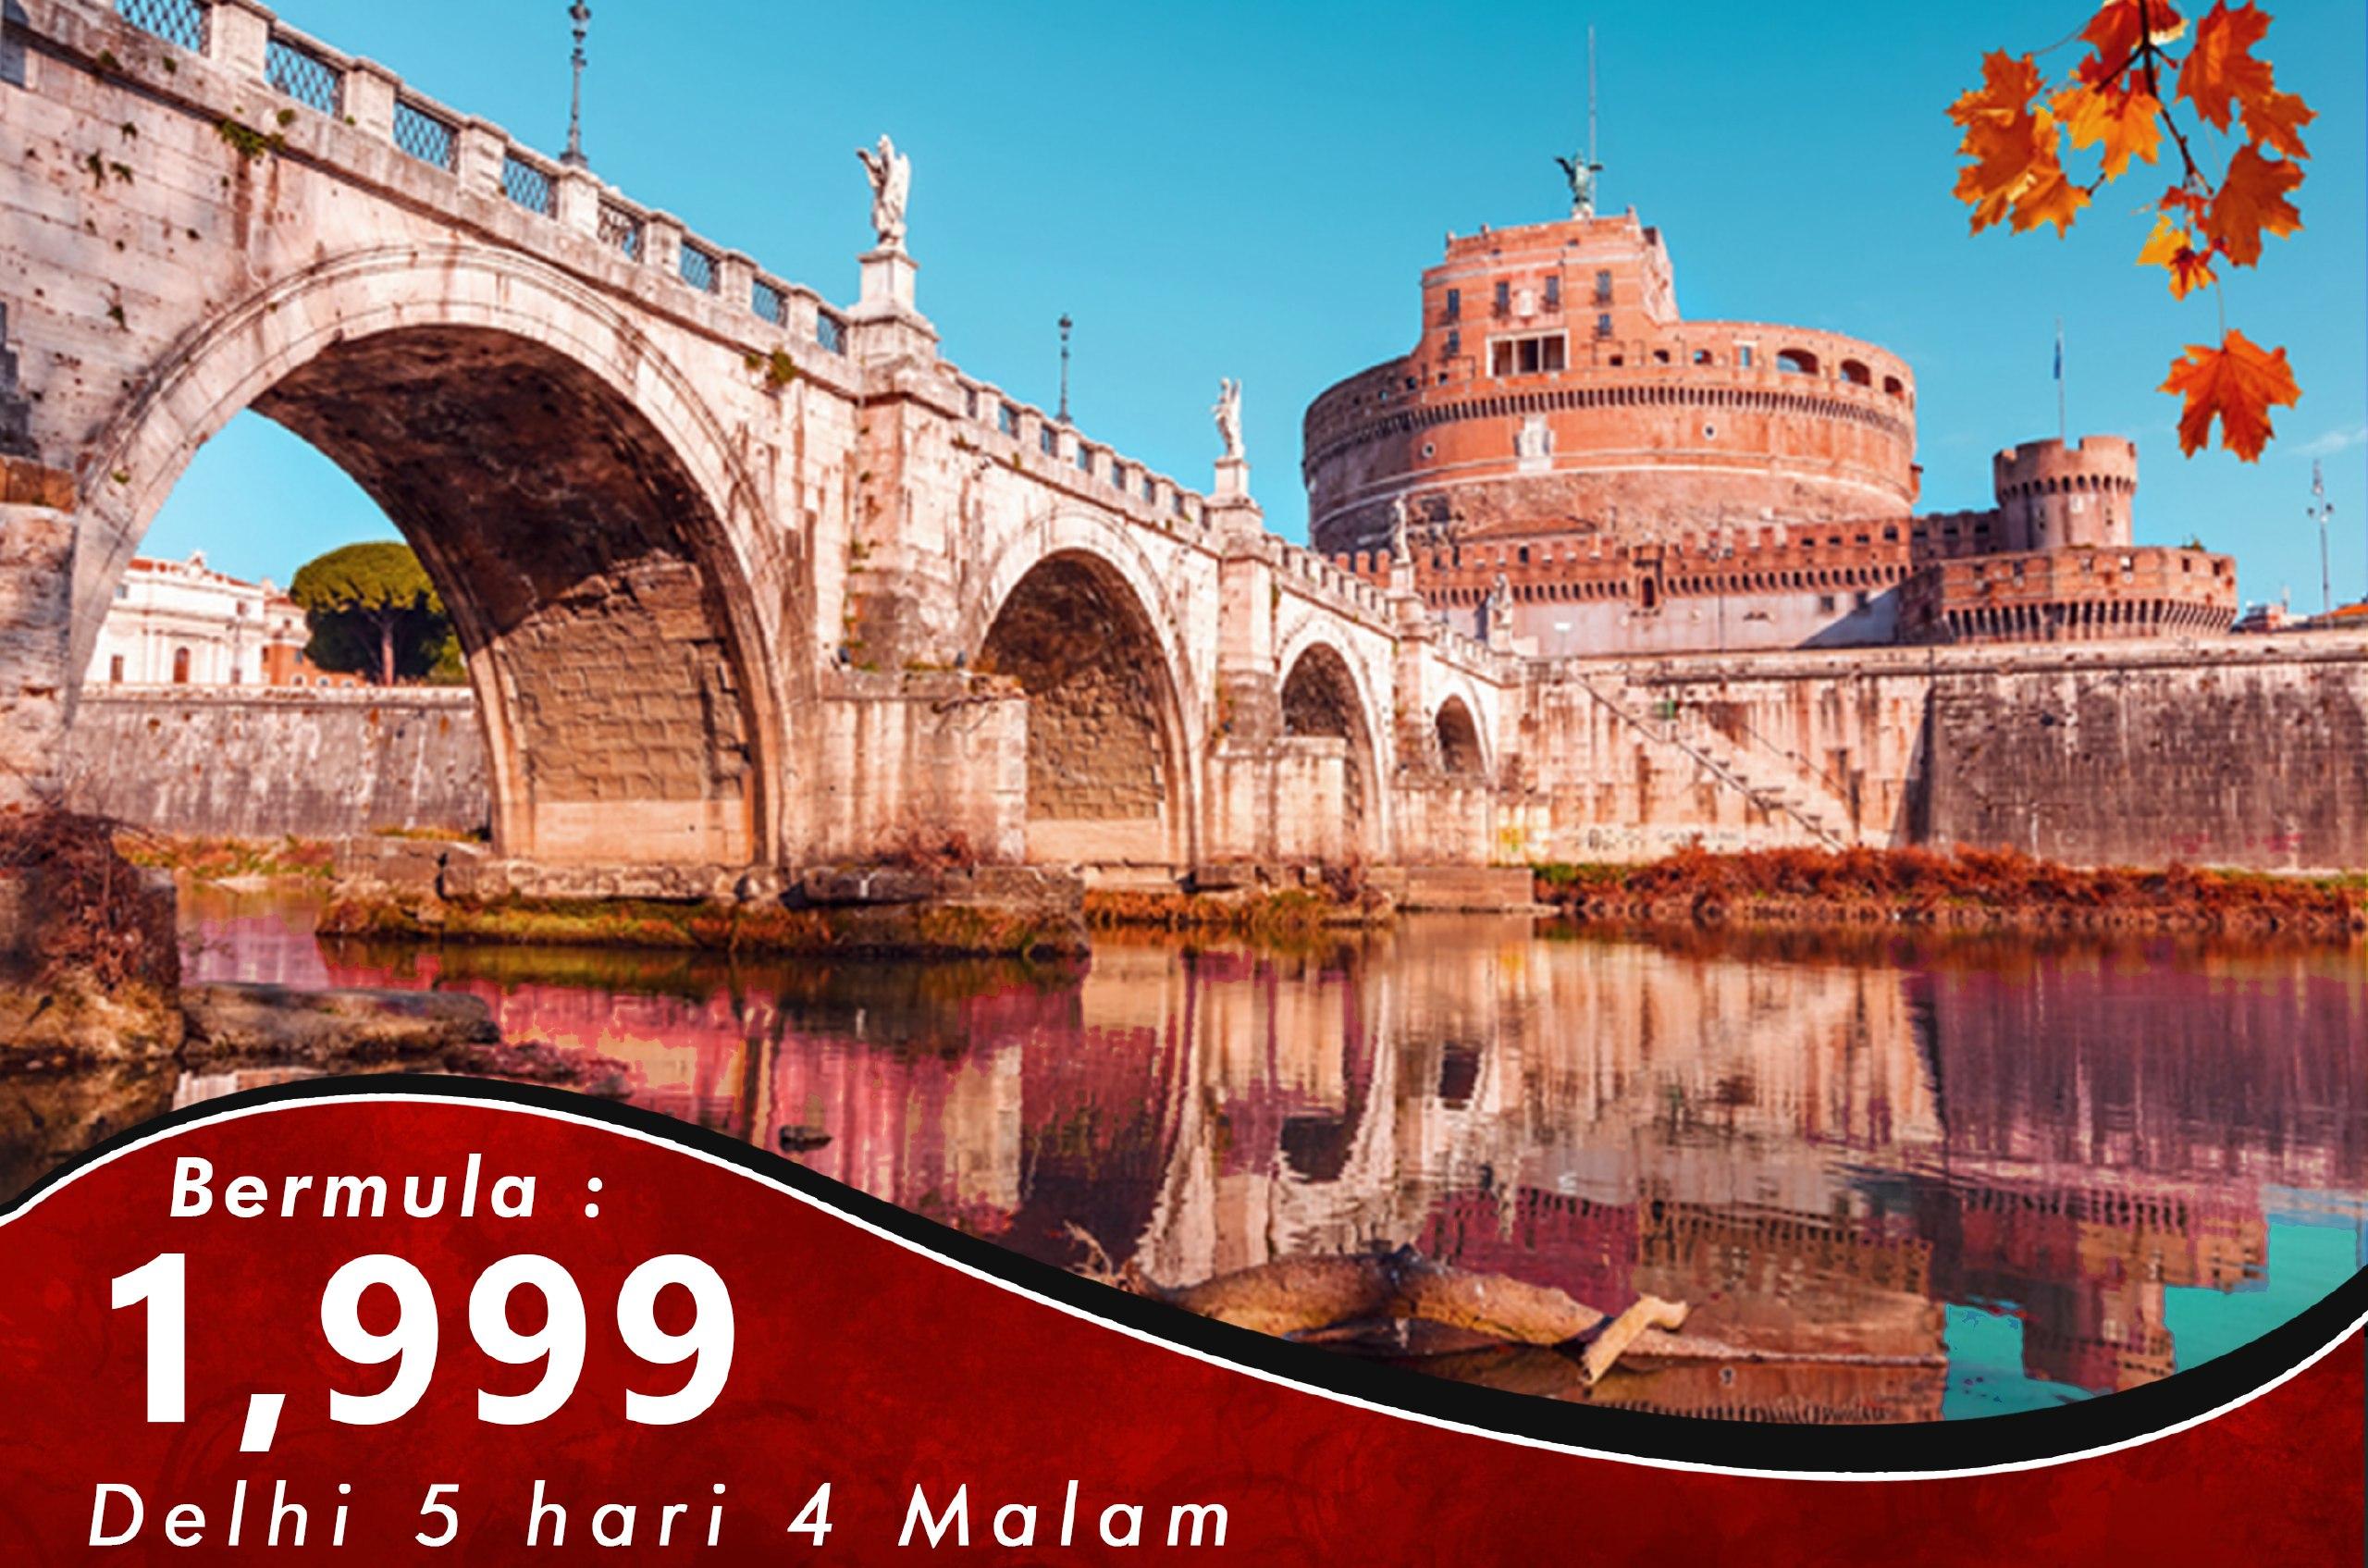 KASHMIR 5 HARI 4 MALAM + DELHI TOUR